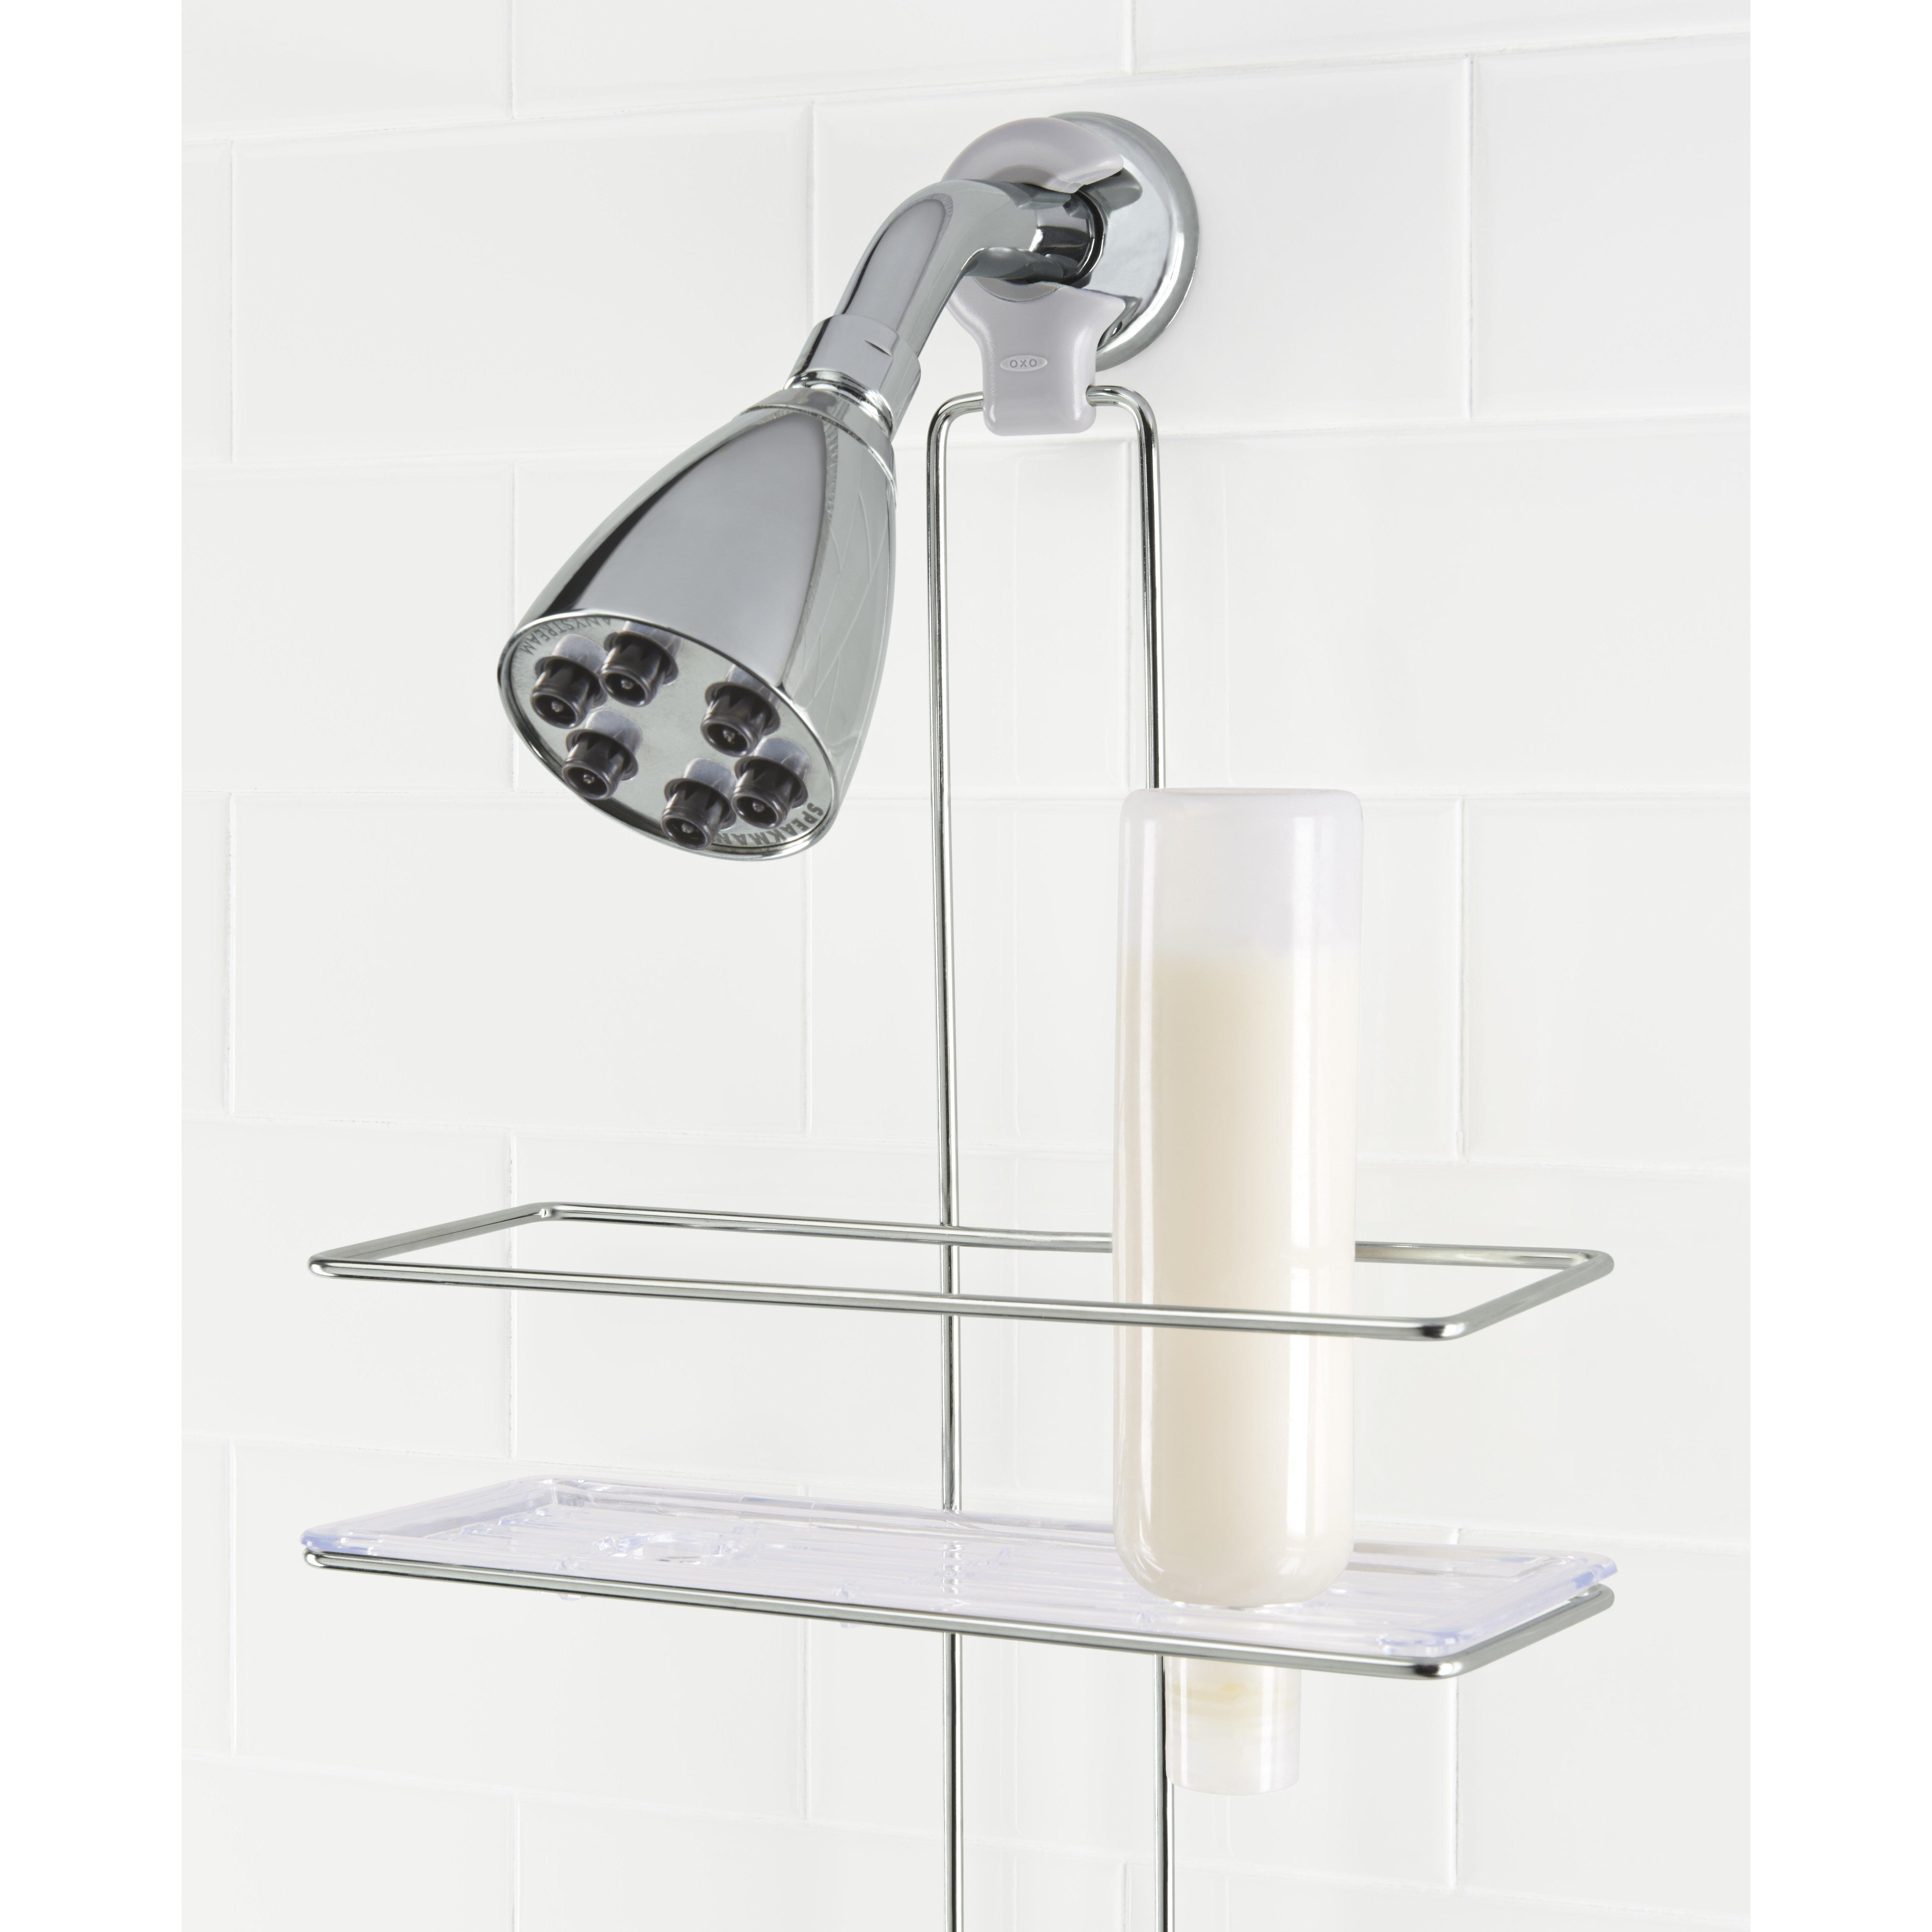 Oxo Bathroom Accessories Oxo Good Grips Shower Caddy Reviews Wayfair